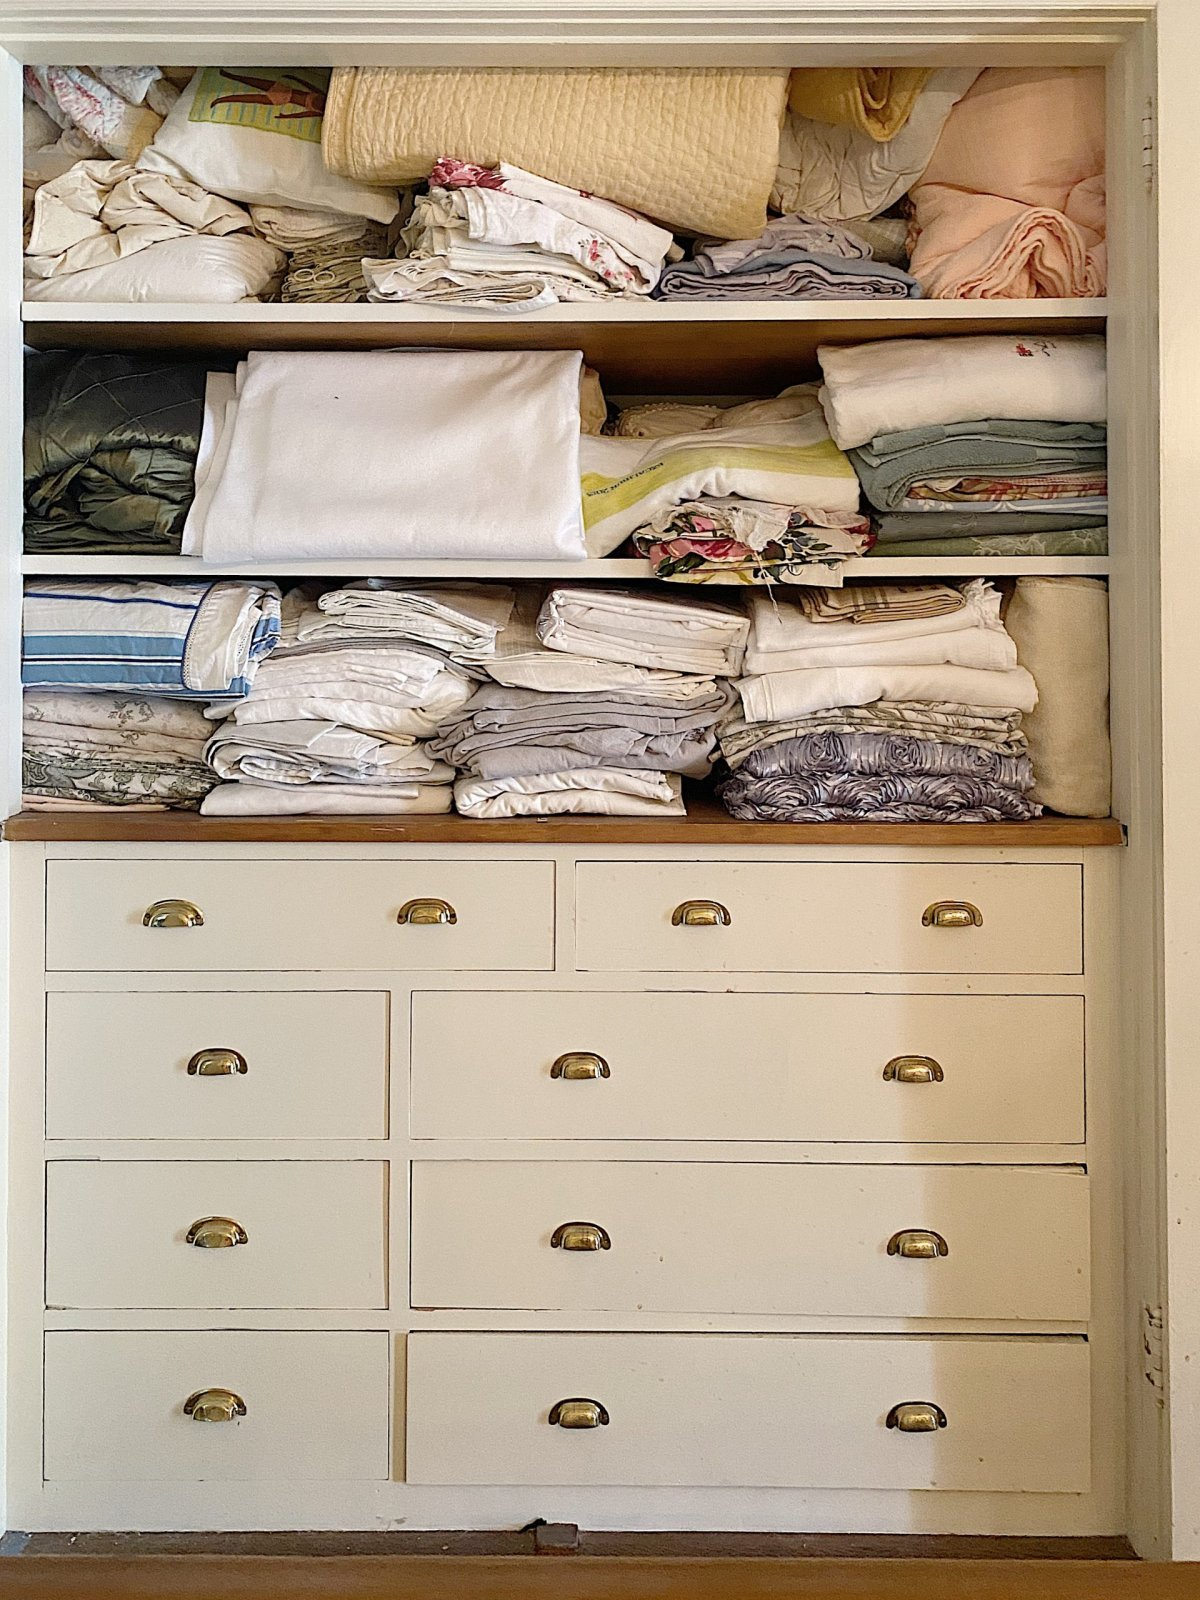 Organize a Linen Closet Before Photo